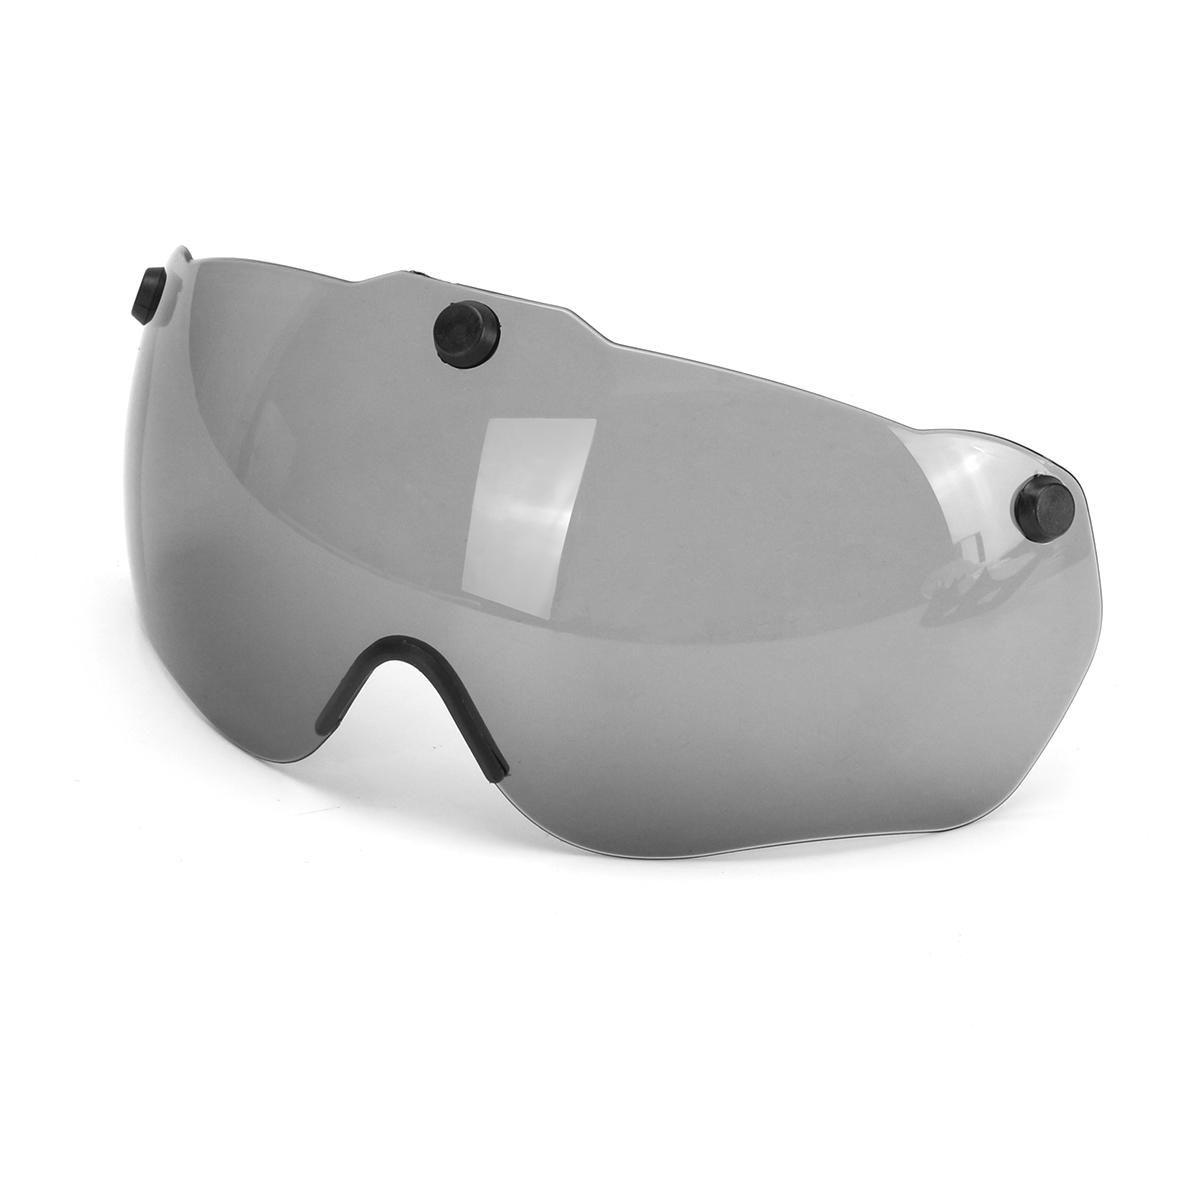 12f4f4e710 GUB K80 Plus Bike Bicycle Helmet Foam Ventilative With Magnetic Goggles  Cycling Helmet Men Women